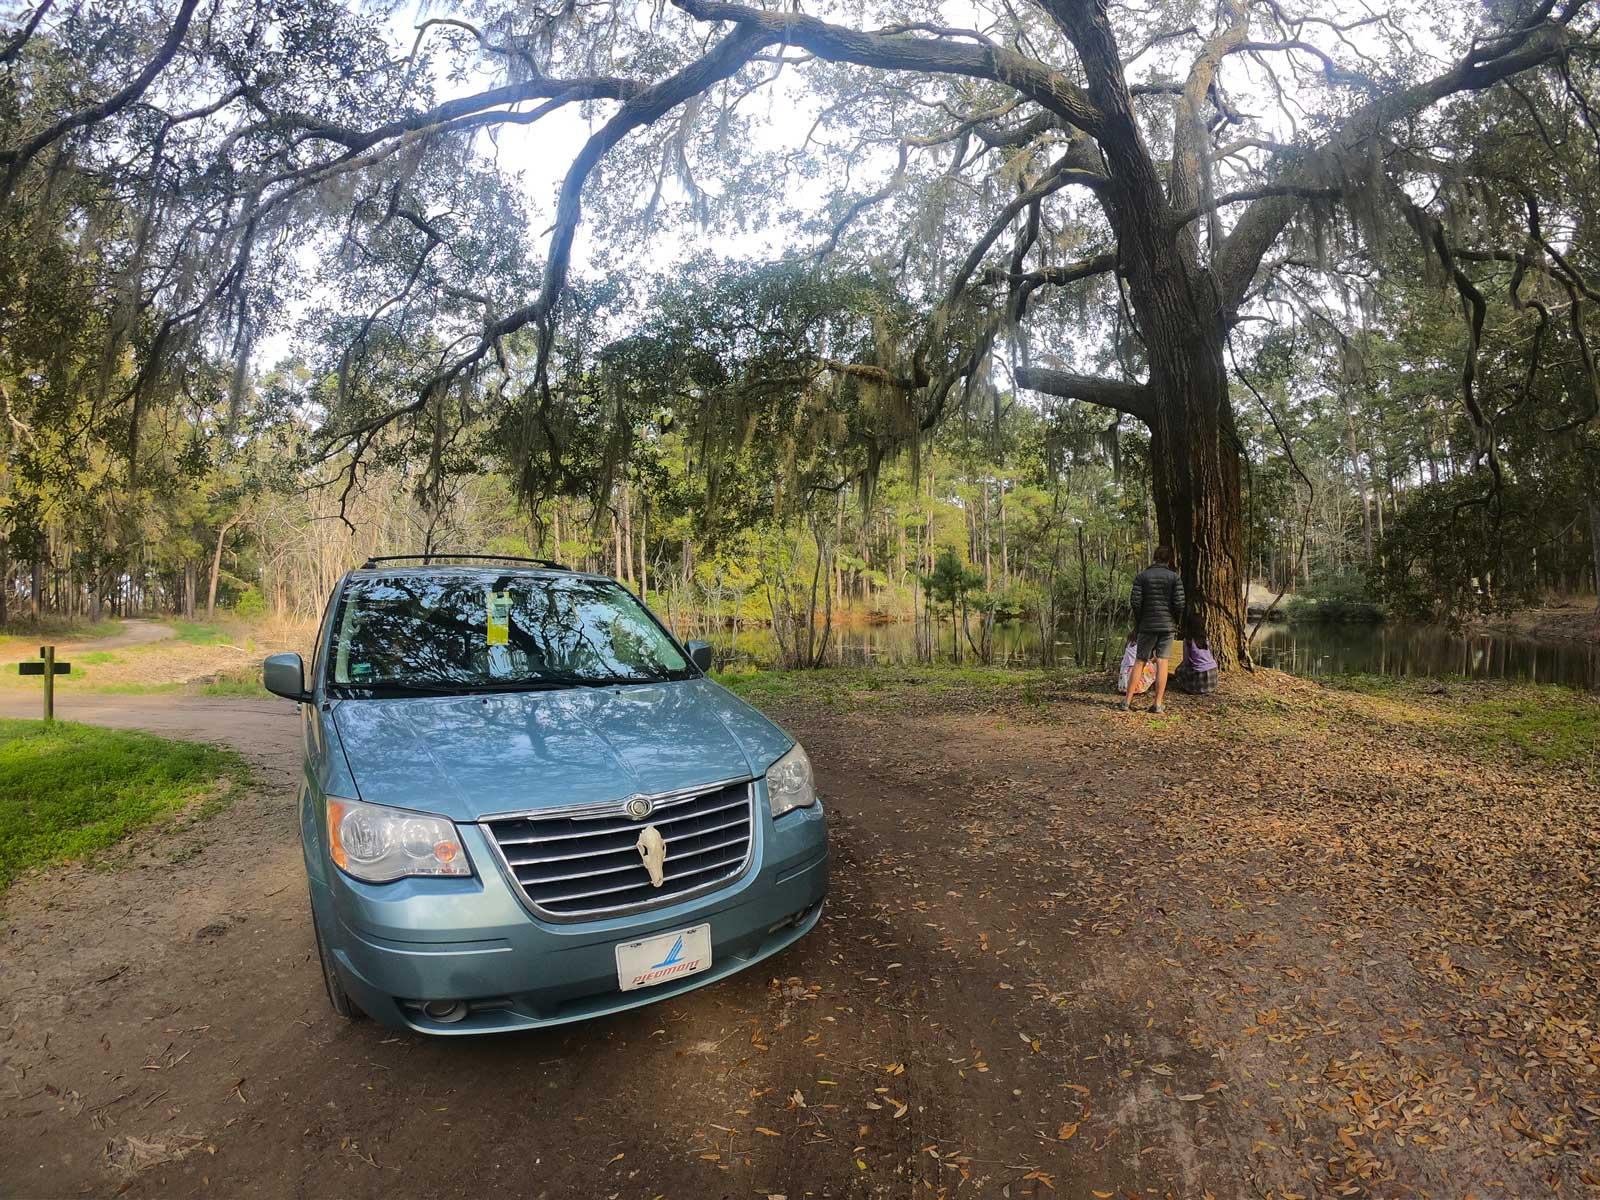 Van parked under a large live oak near Botany Bay pond at the Botany Bay Plantation, Edisto Island, SC